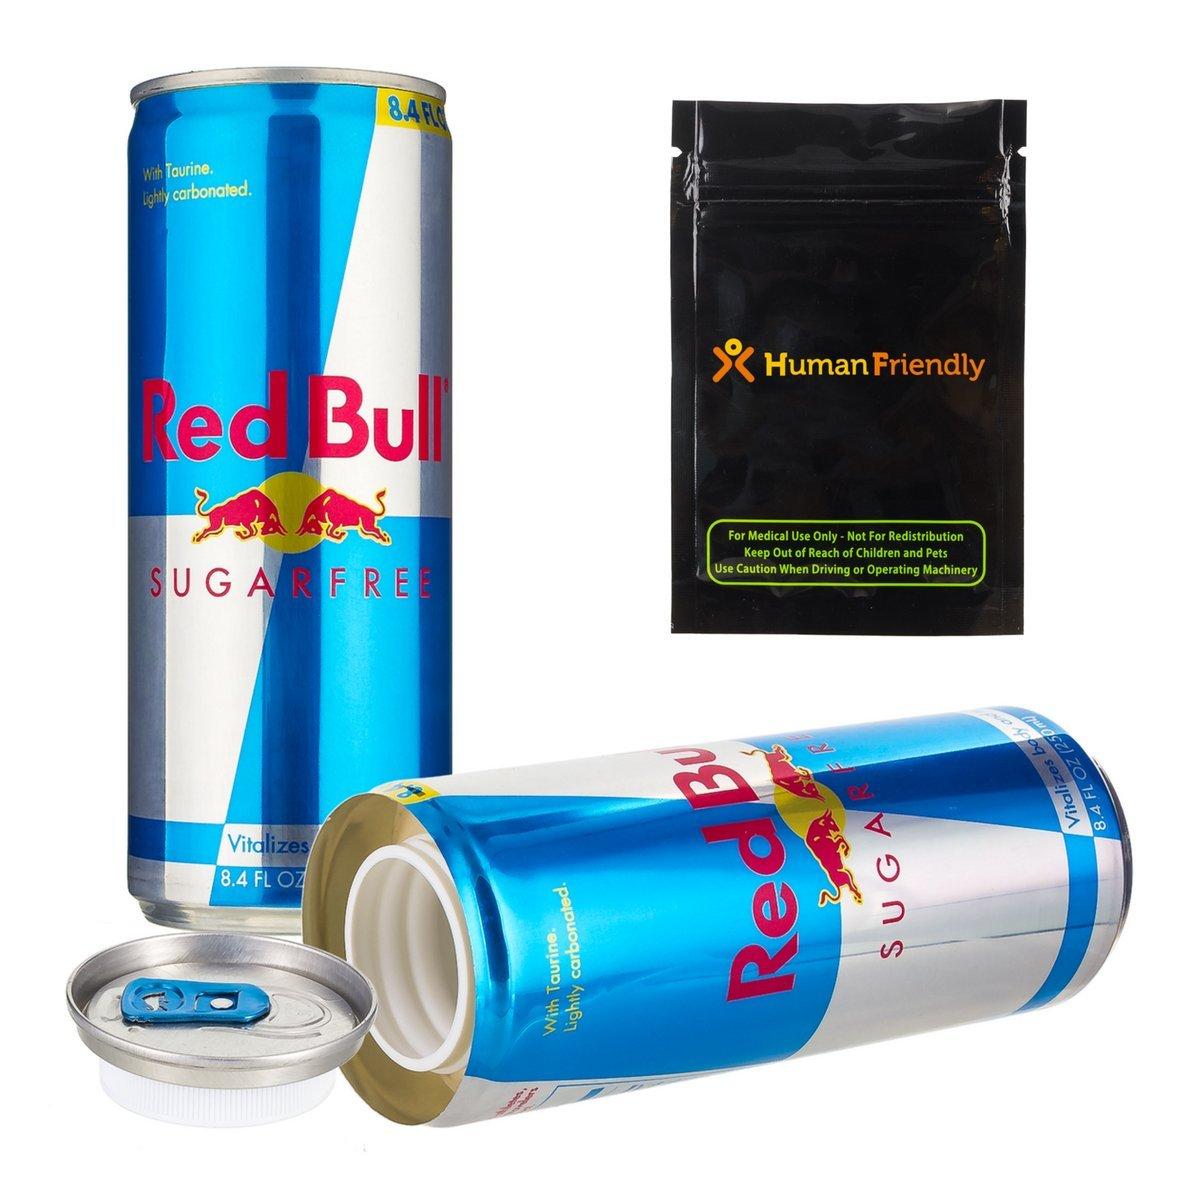 Red Bull Sugar Free DiversionセーフSecret Stash Can 8oz W humanfriendly Smell Proofバッグ B0753BDVGY